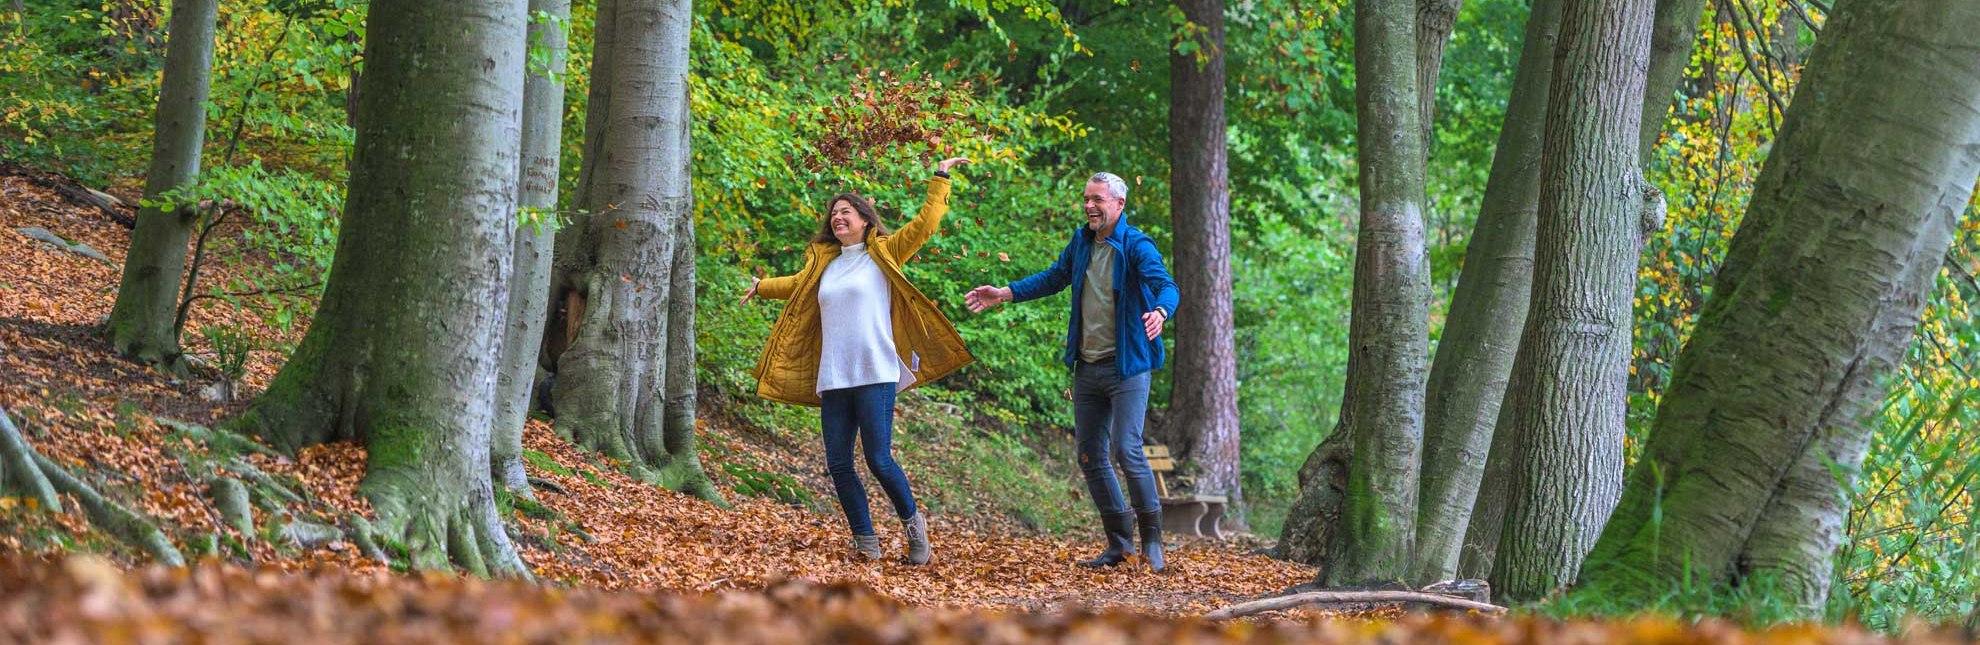 Tanz im bunten Herbstlaub, © Alex K. Media / HLMS GmbH